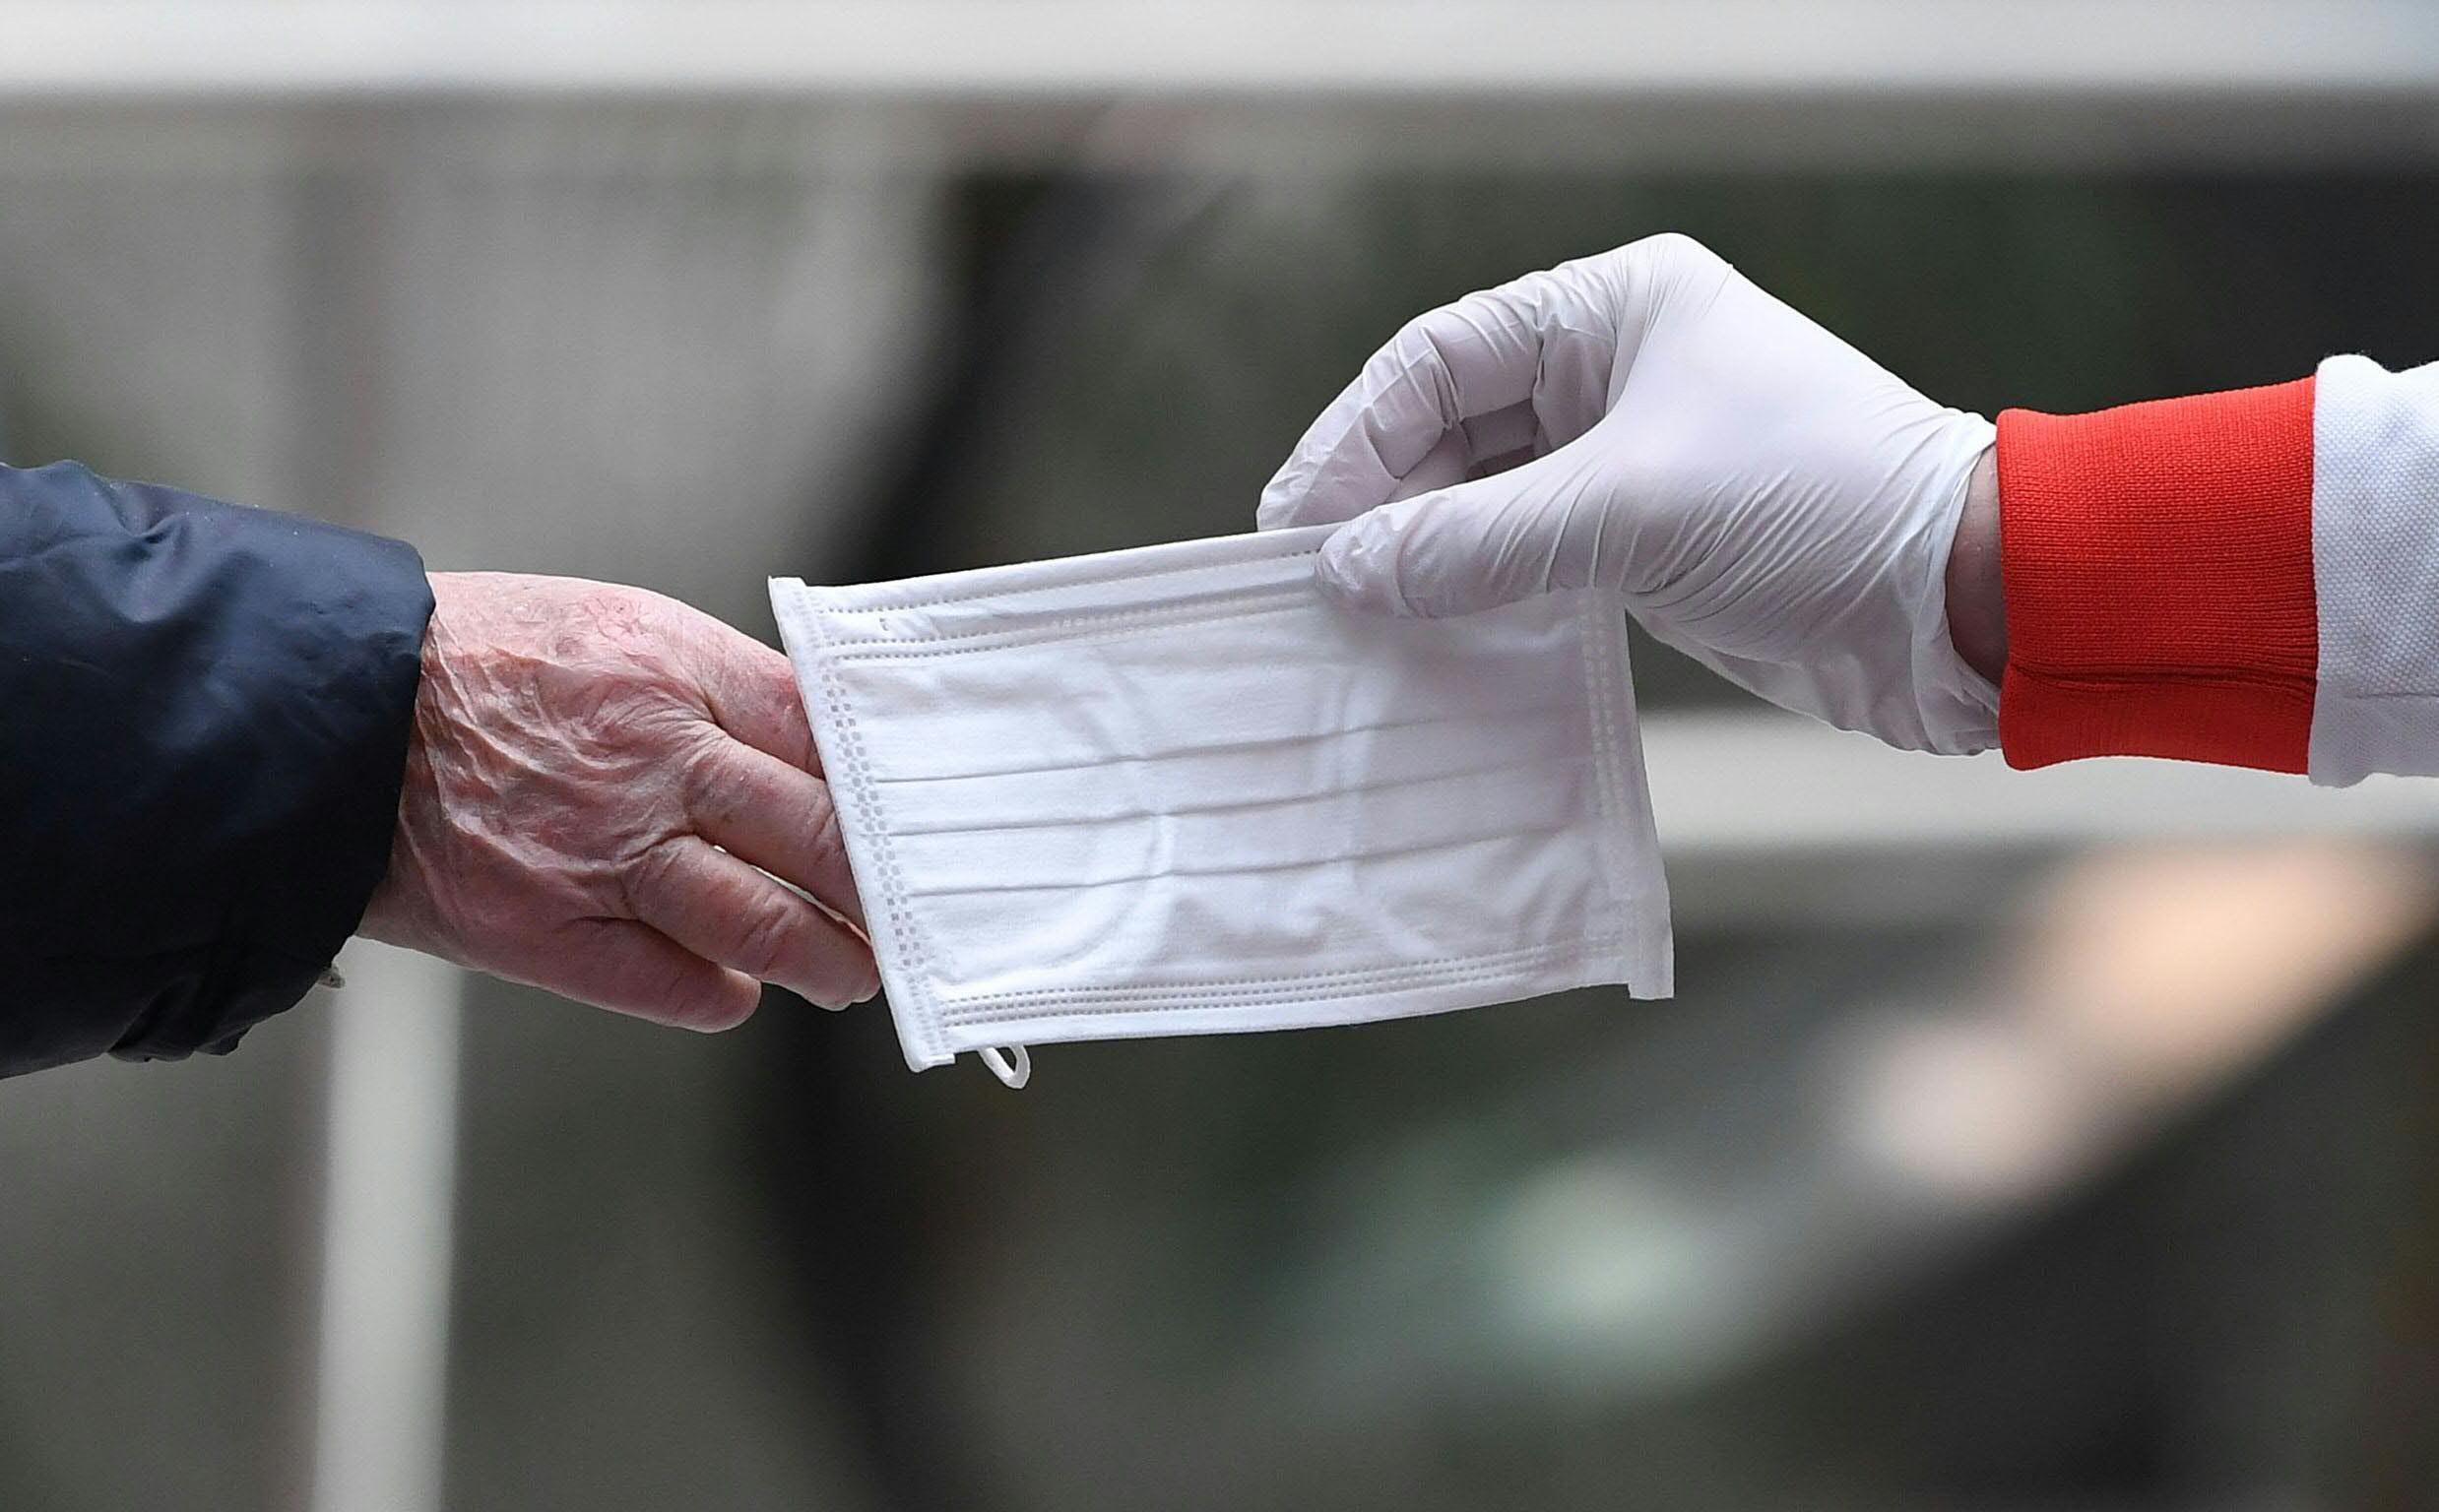 Verpleegkundigenbond overweegt juridische stappen om RIVM-richtlijn mondkapjes in ouderenzorg